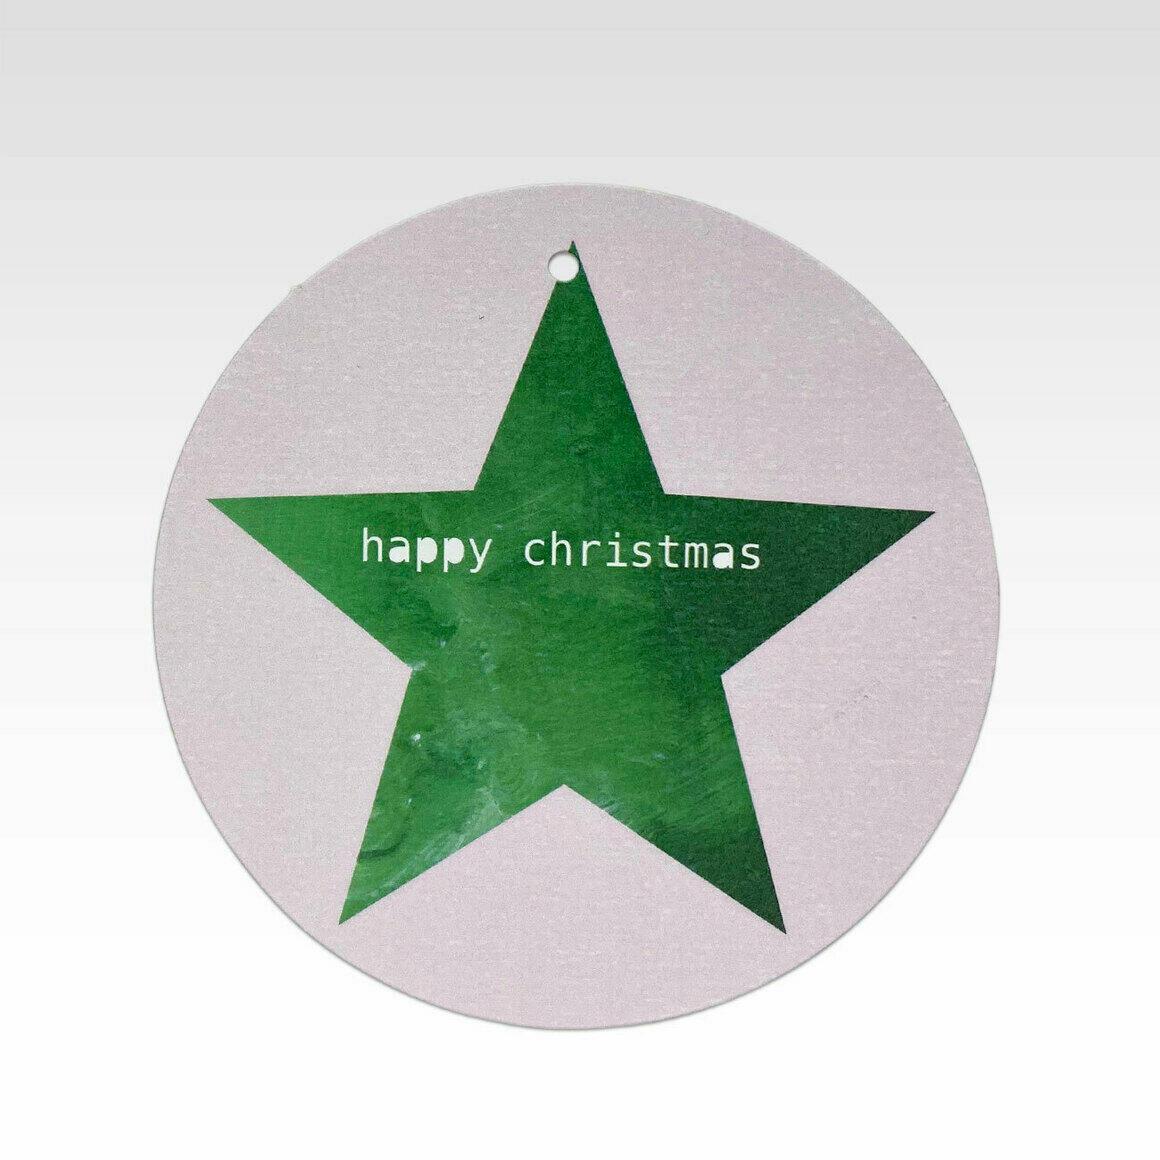 TAG081 – Green Star Happy Christmas   Trada Marketplace